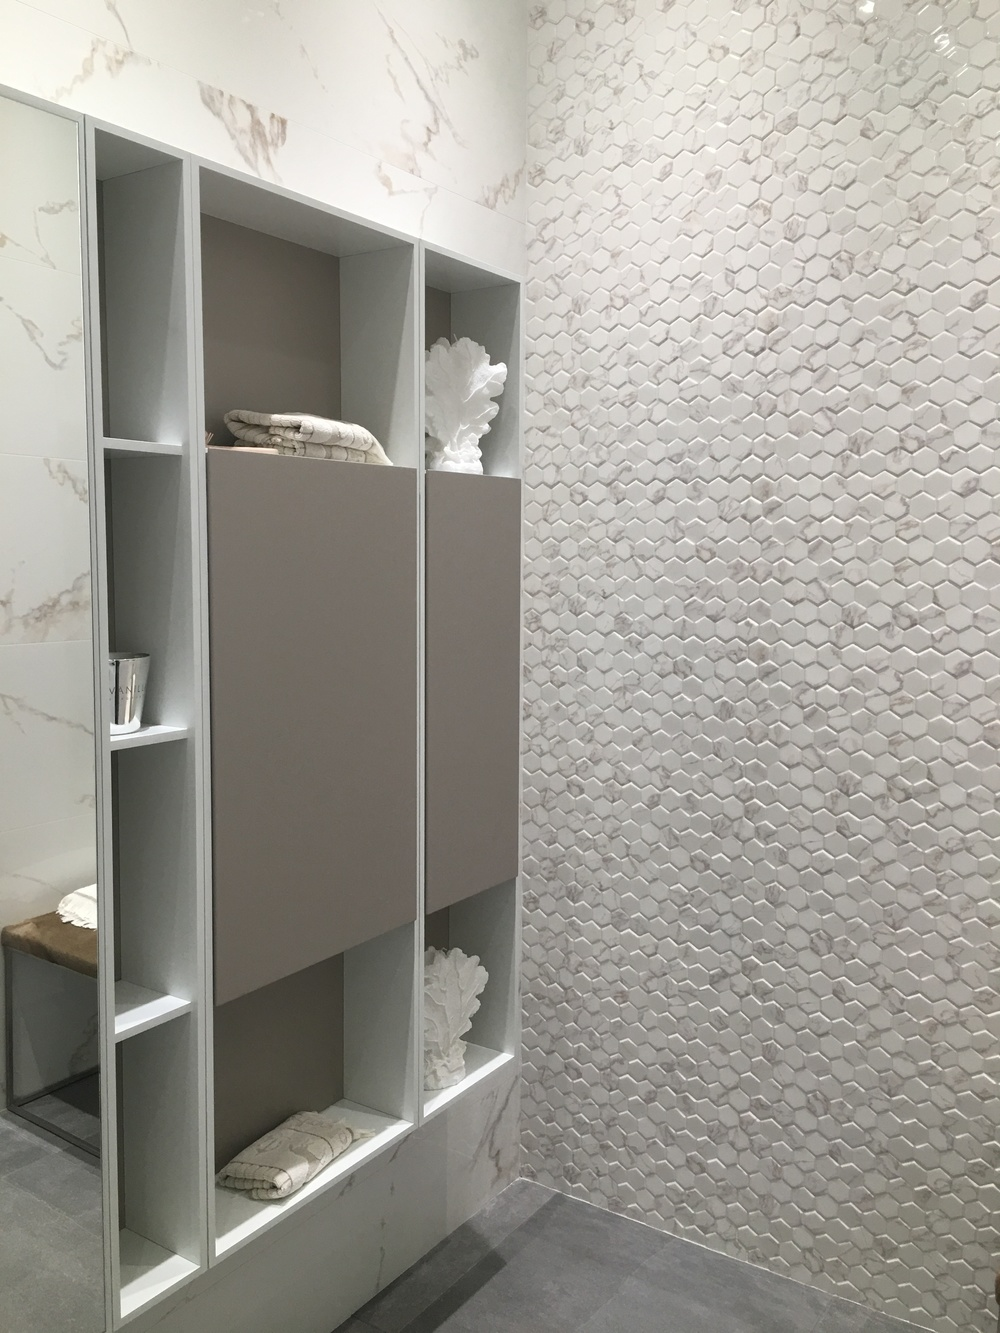 Simple but smart tile applications